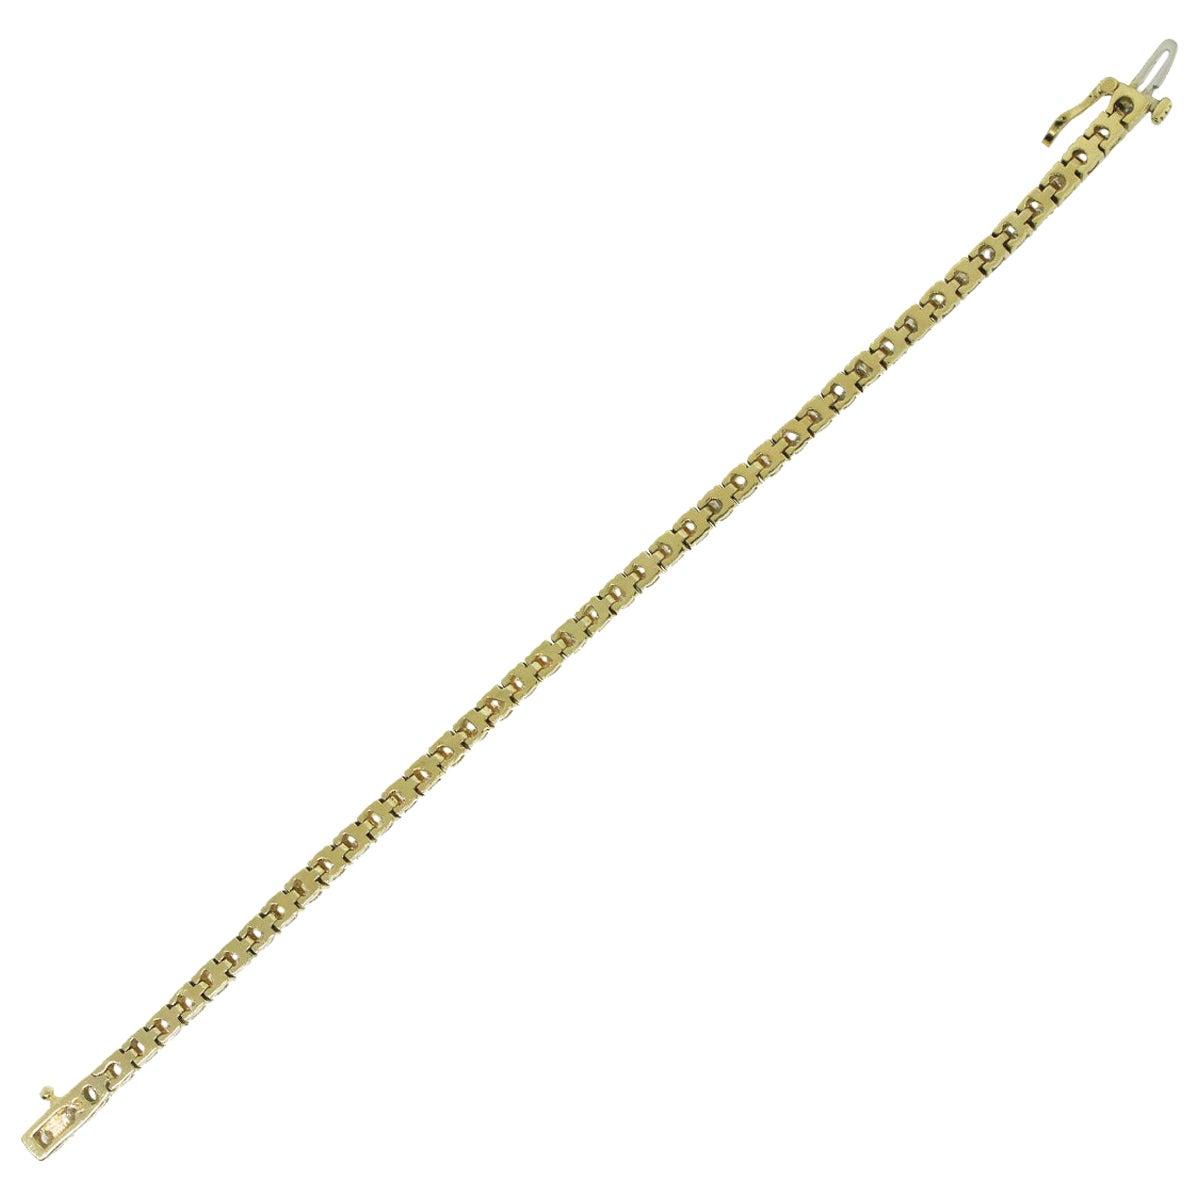 3 Carat Diamond Tennis Bracelet